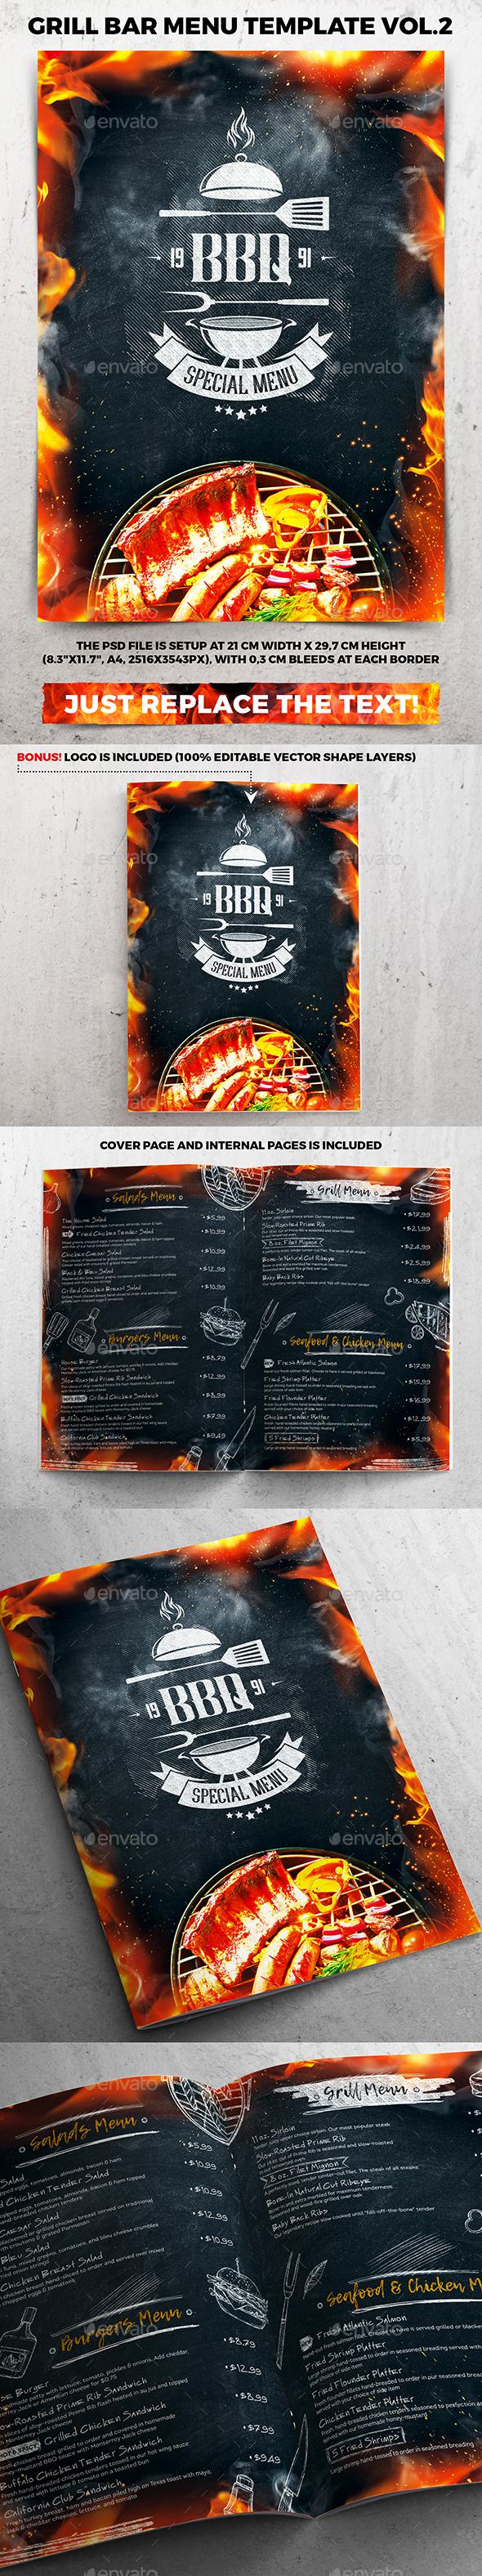 Grill Bar Menu Template vol.2 - Food Menus Print Templates